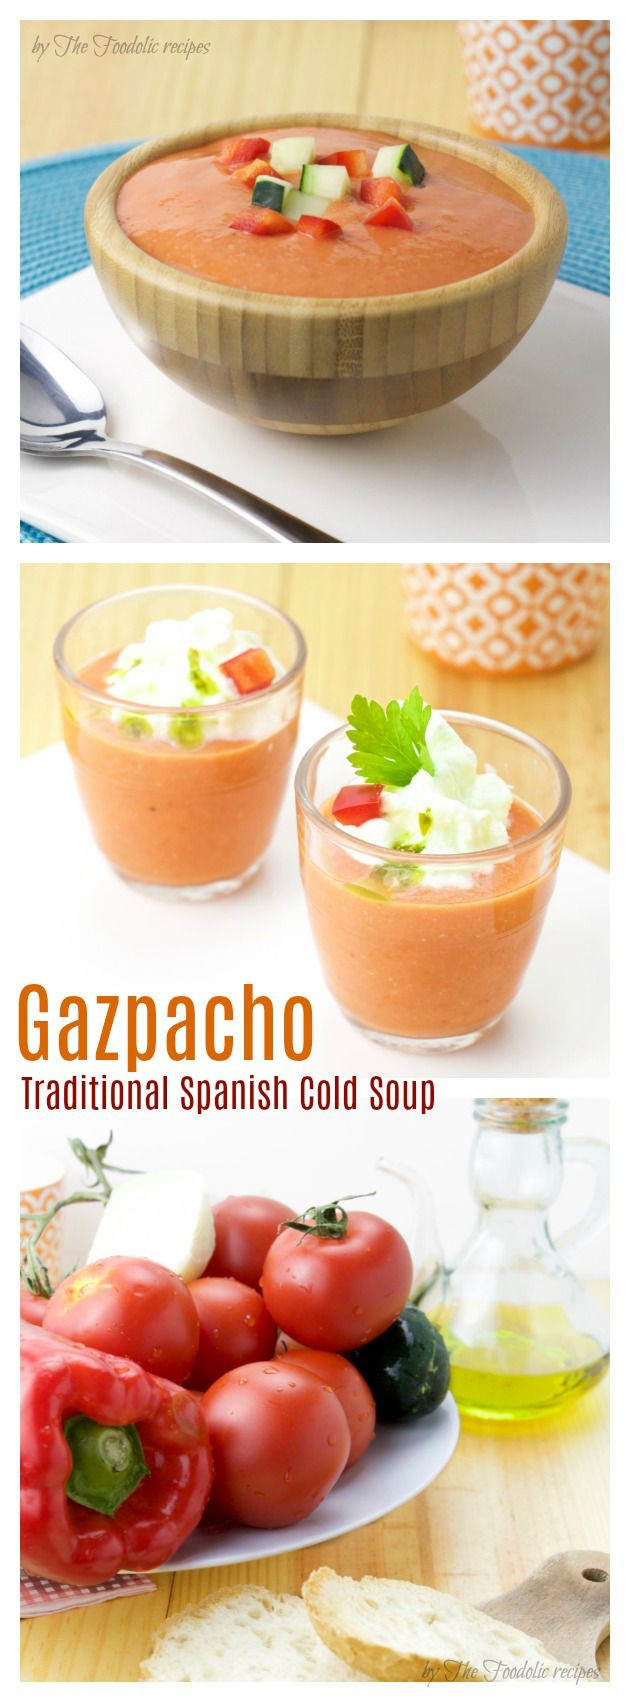 Spanish cold soup gazpacho tapas #gazpacho #spanish